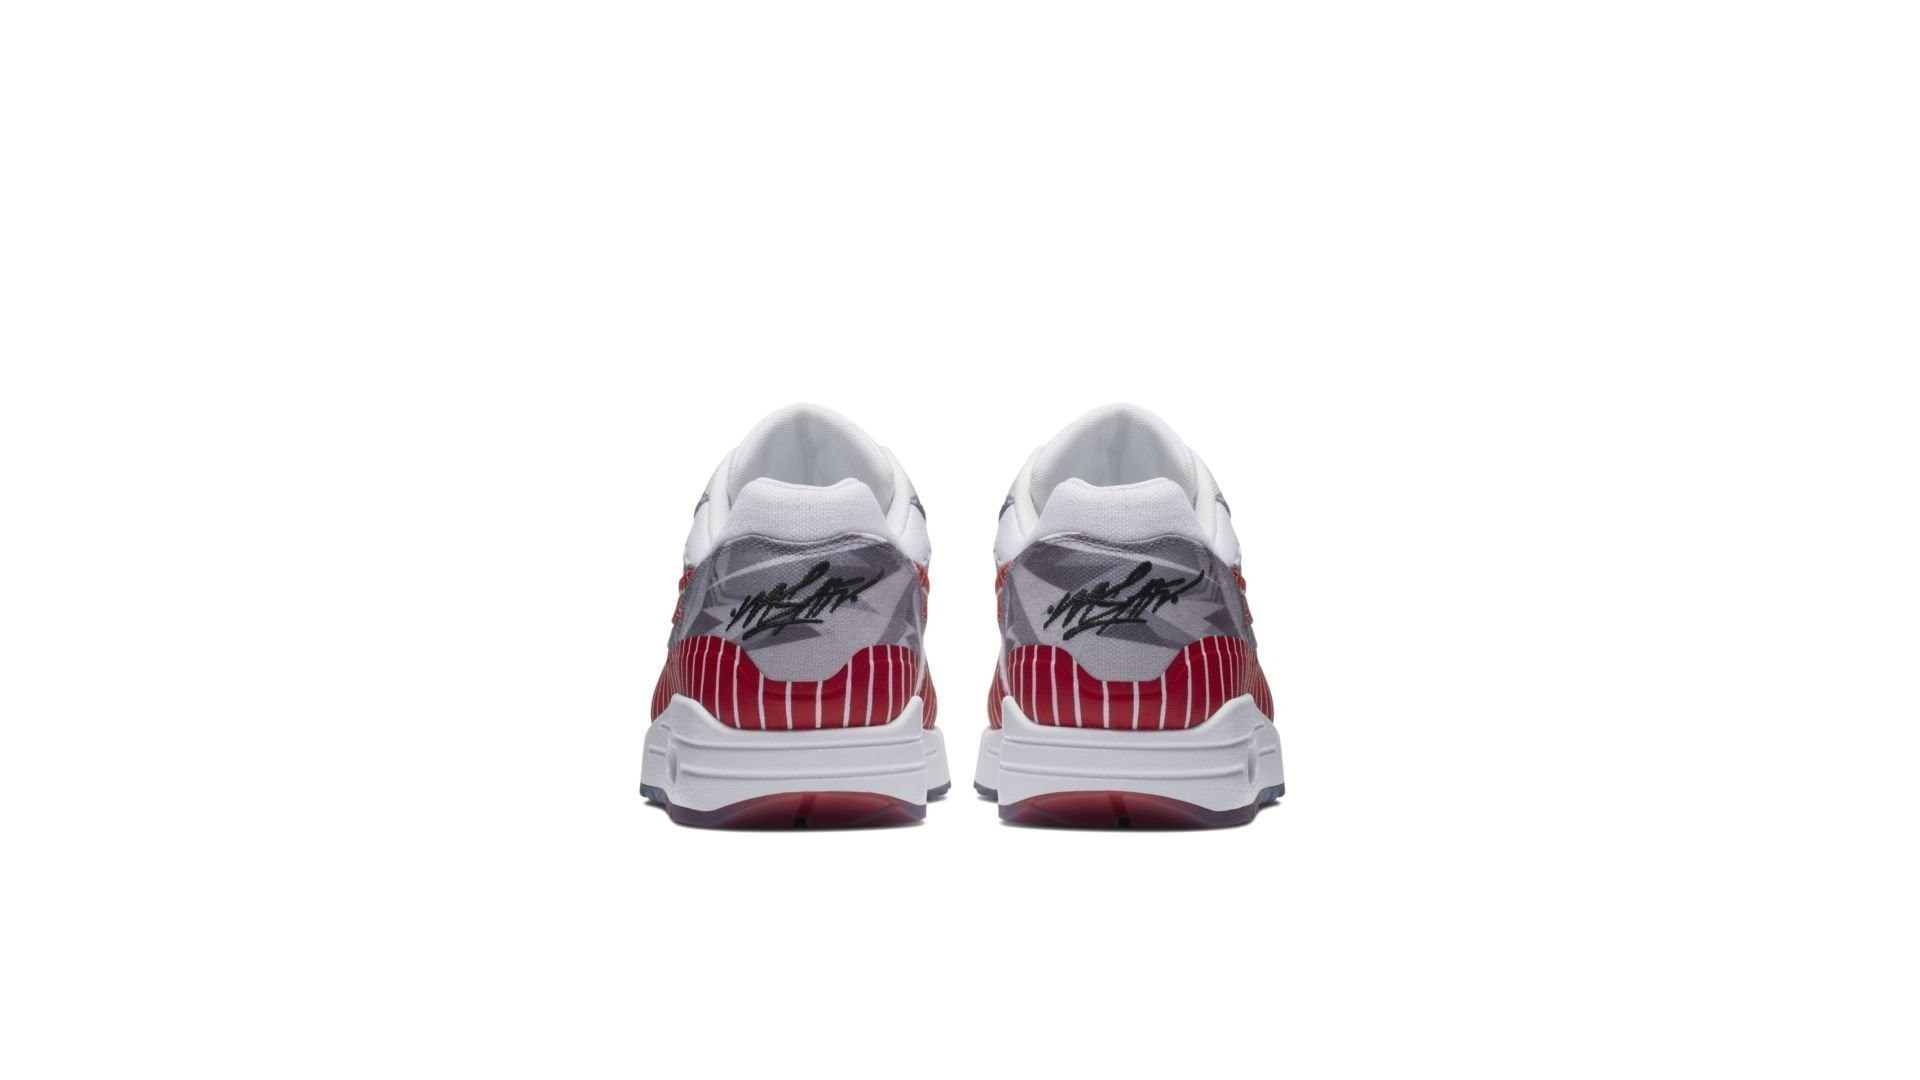 Nike Air Max 1 AH7740-100